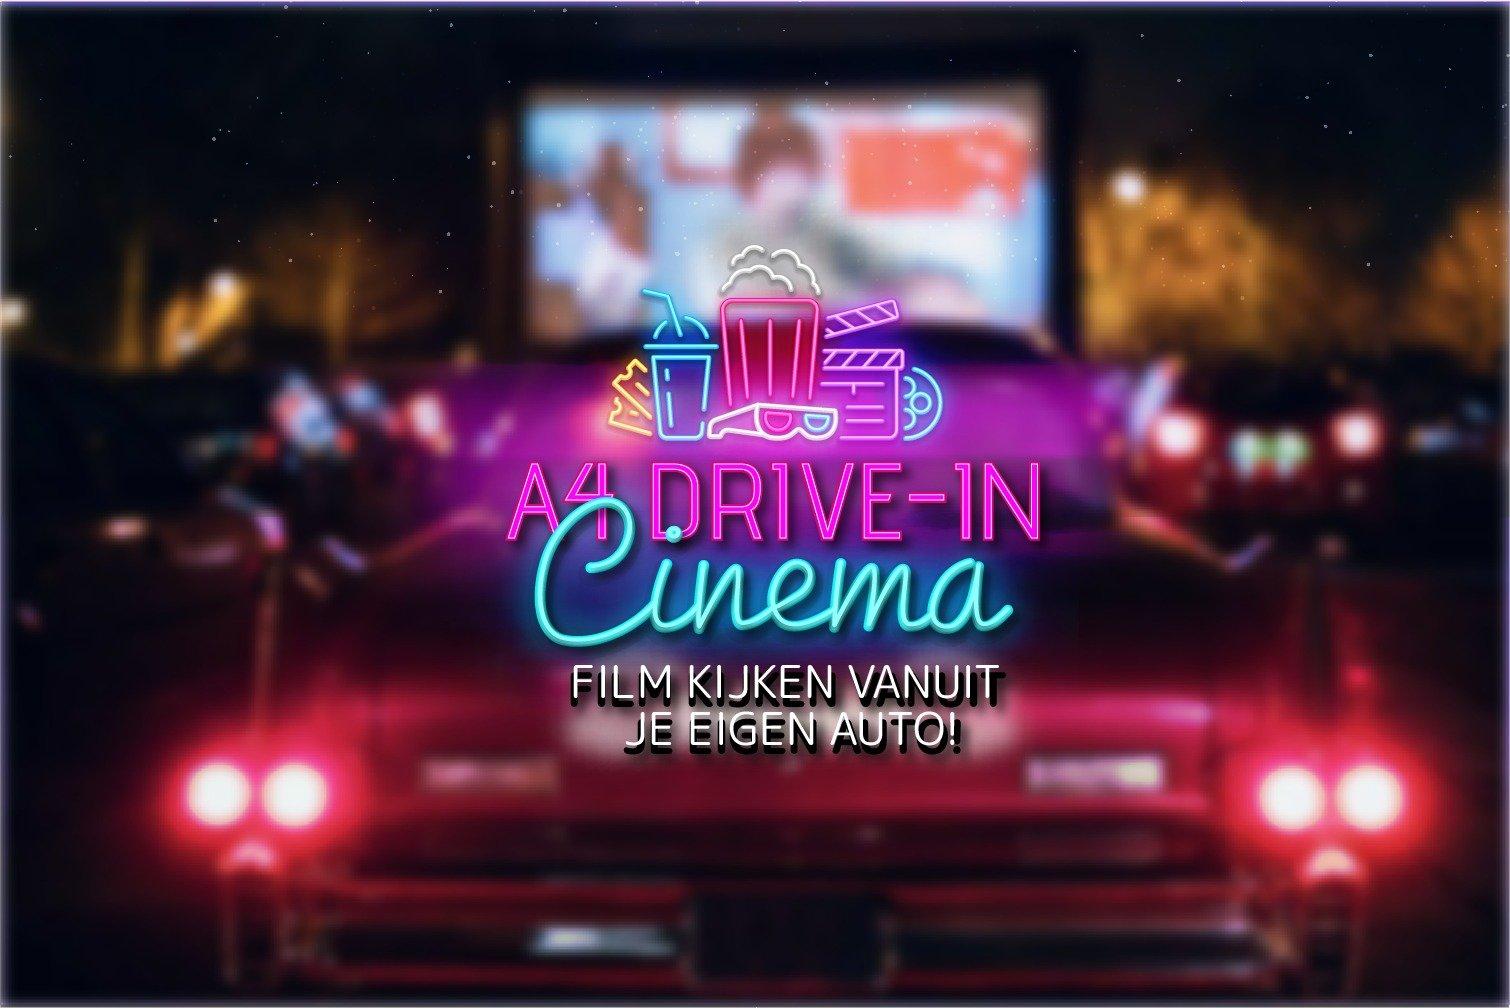 Drive-in bioscoop: Footloose